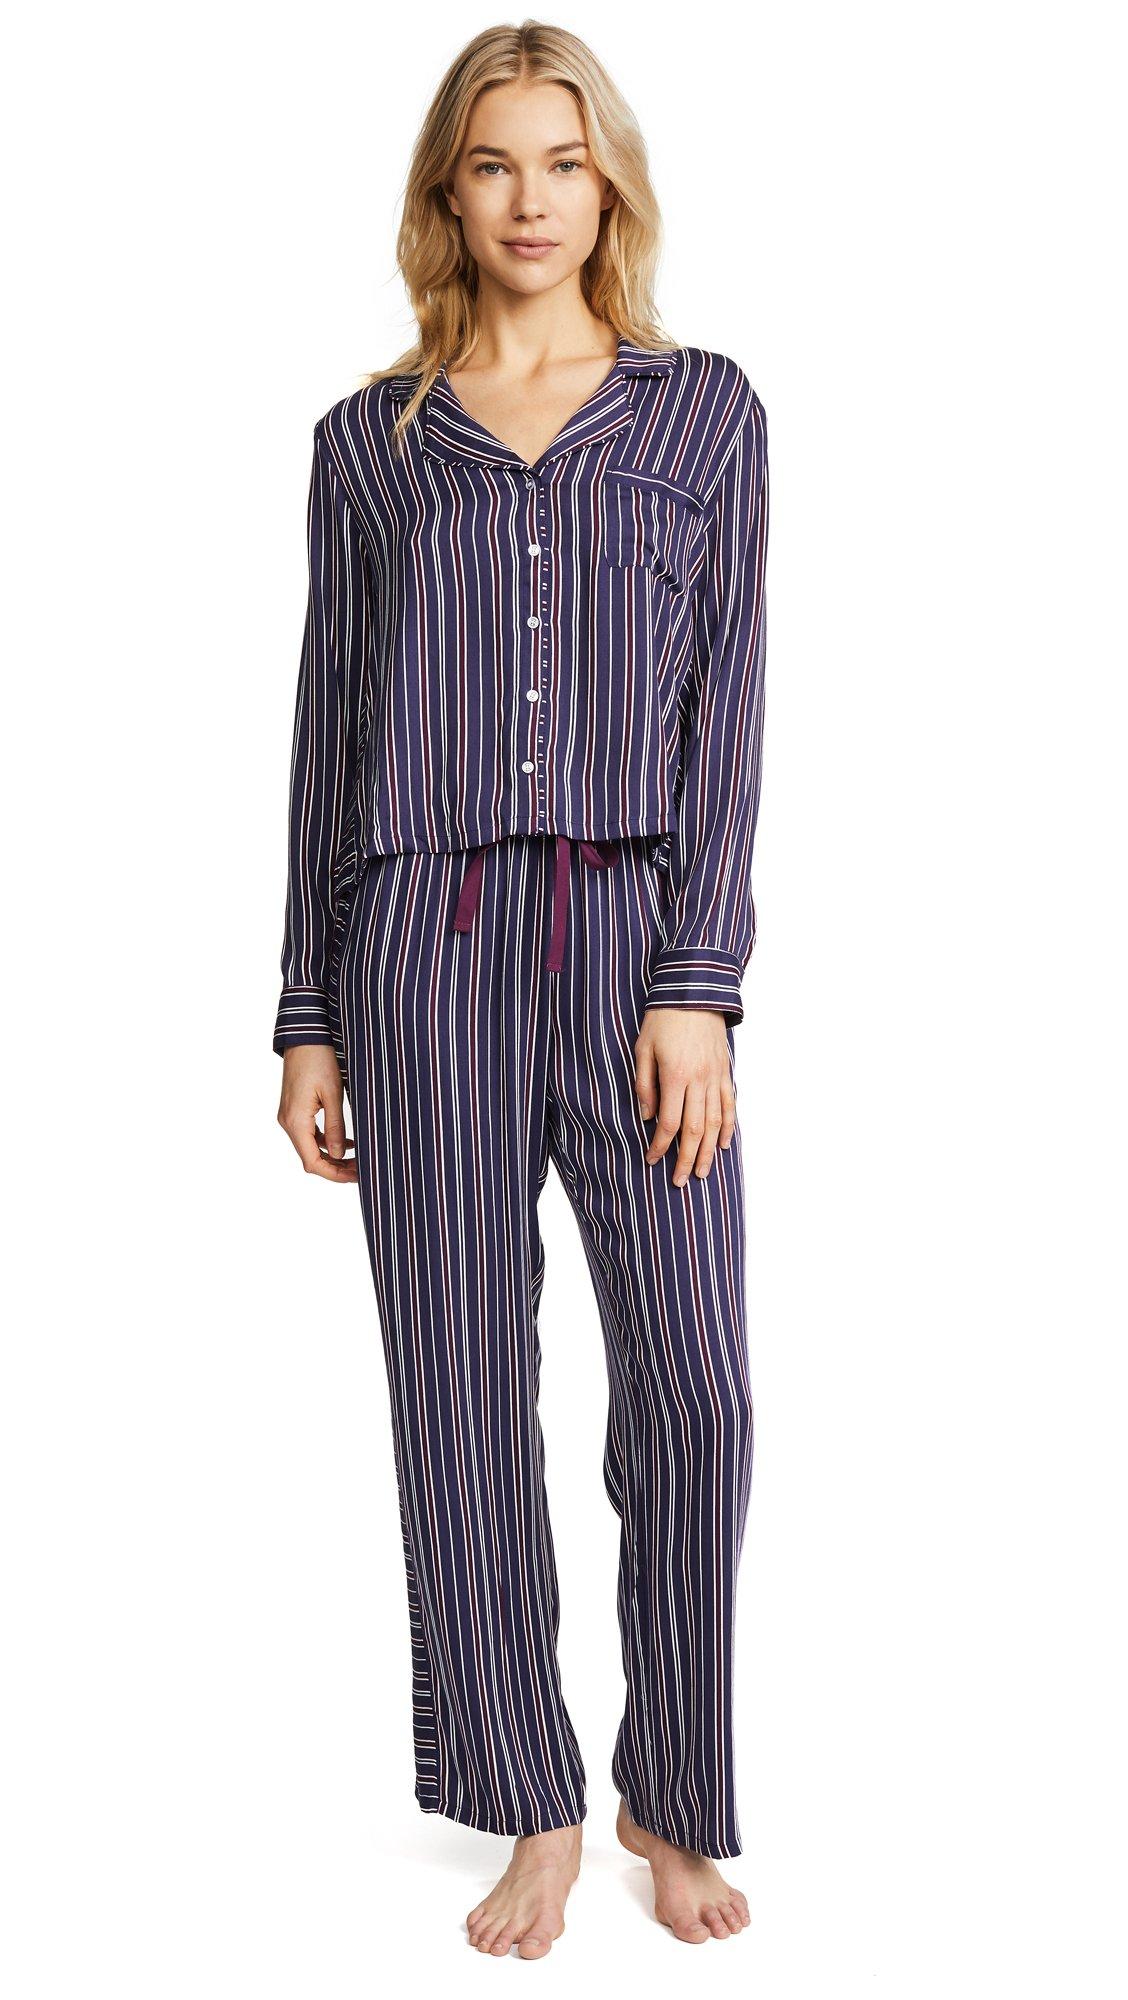 Splendid Women's Inviting Stripe PJ Set, Inviting Stripe, X-Small